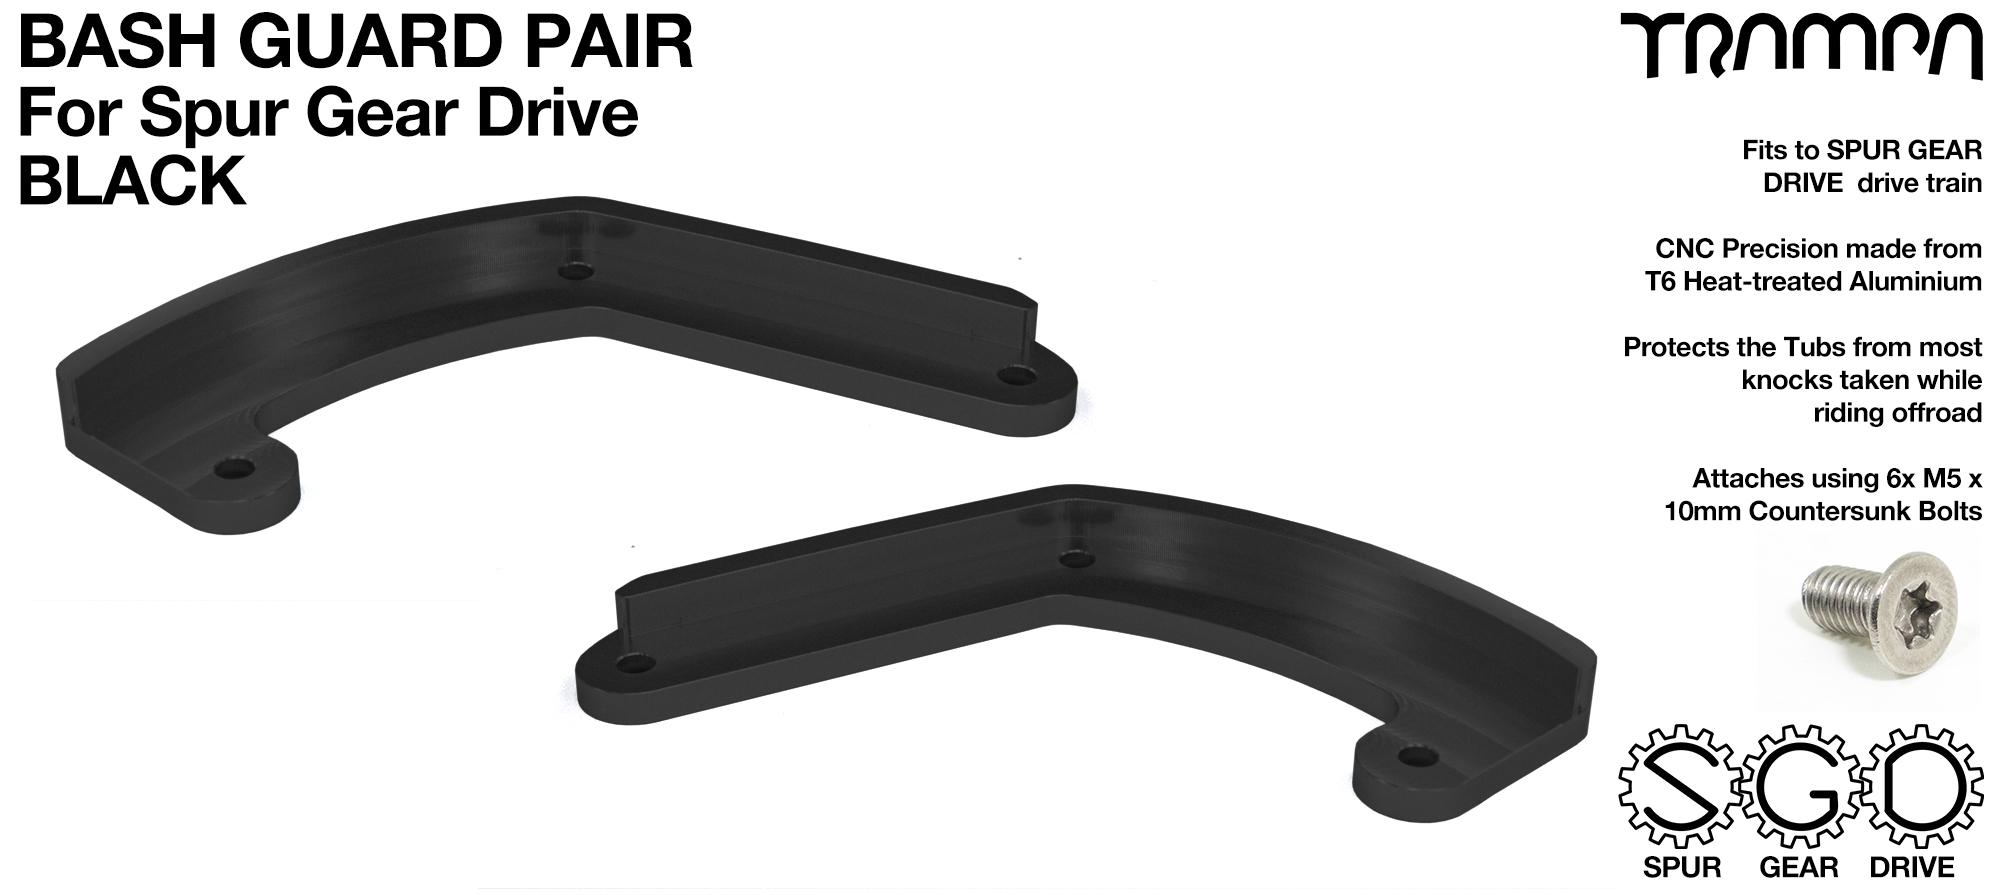 MkII Spur Gear Drive Bash Guards PAIR - BLACK